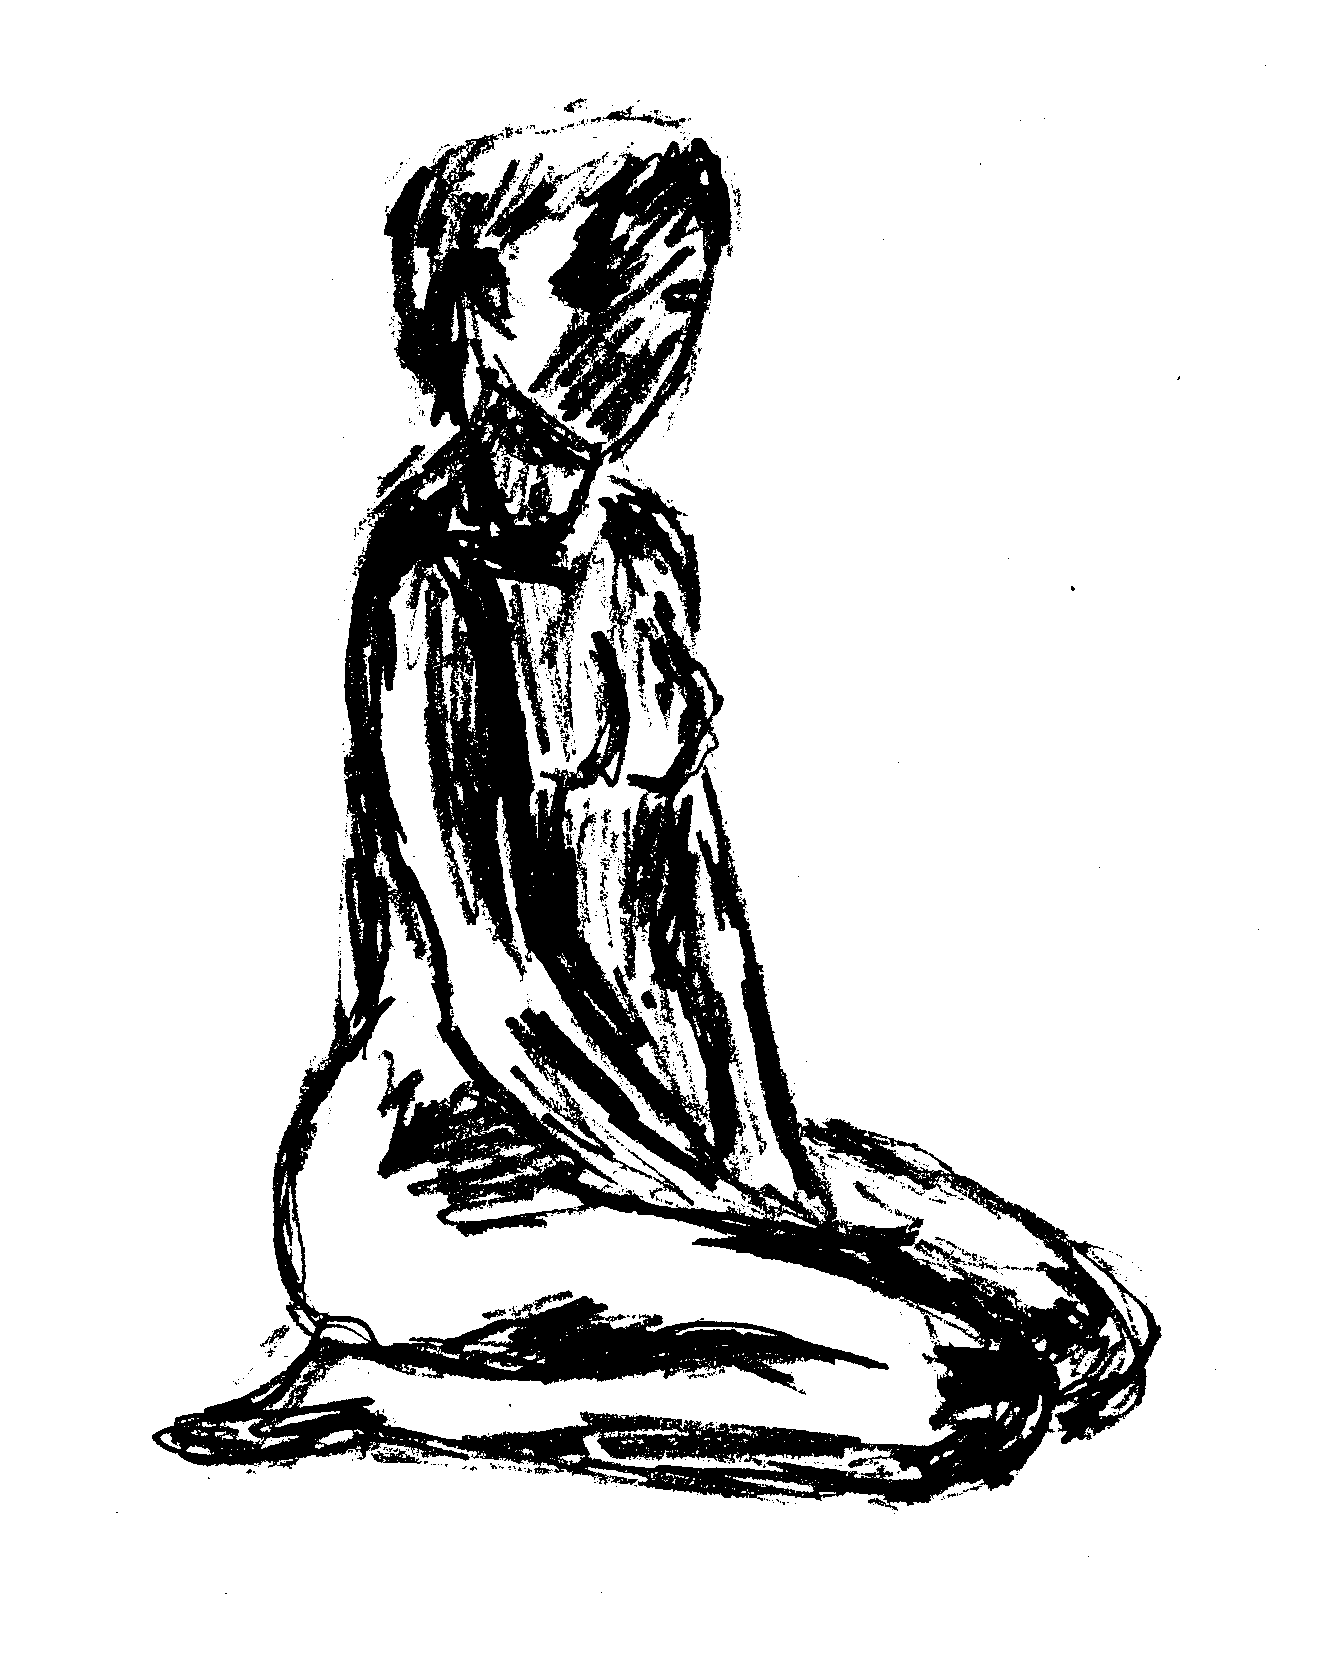 How To Draw A Person Kneeling : person, kneeling, Kneeling, Drawing, GetDrawings, Download